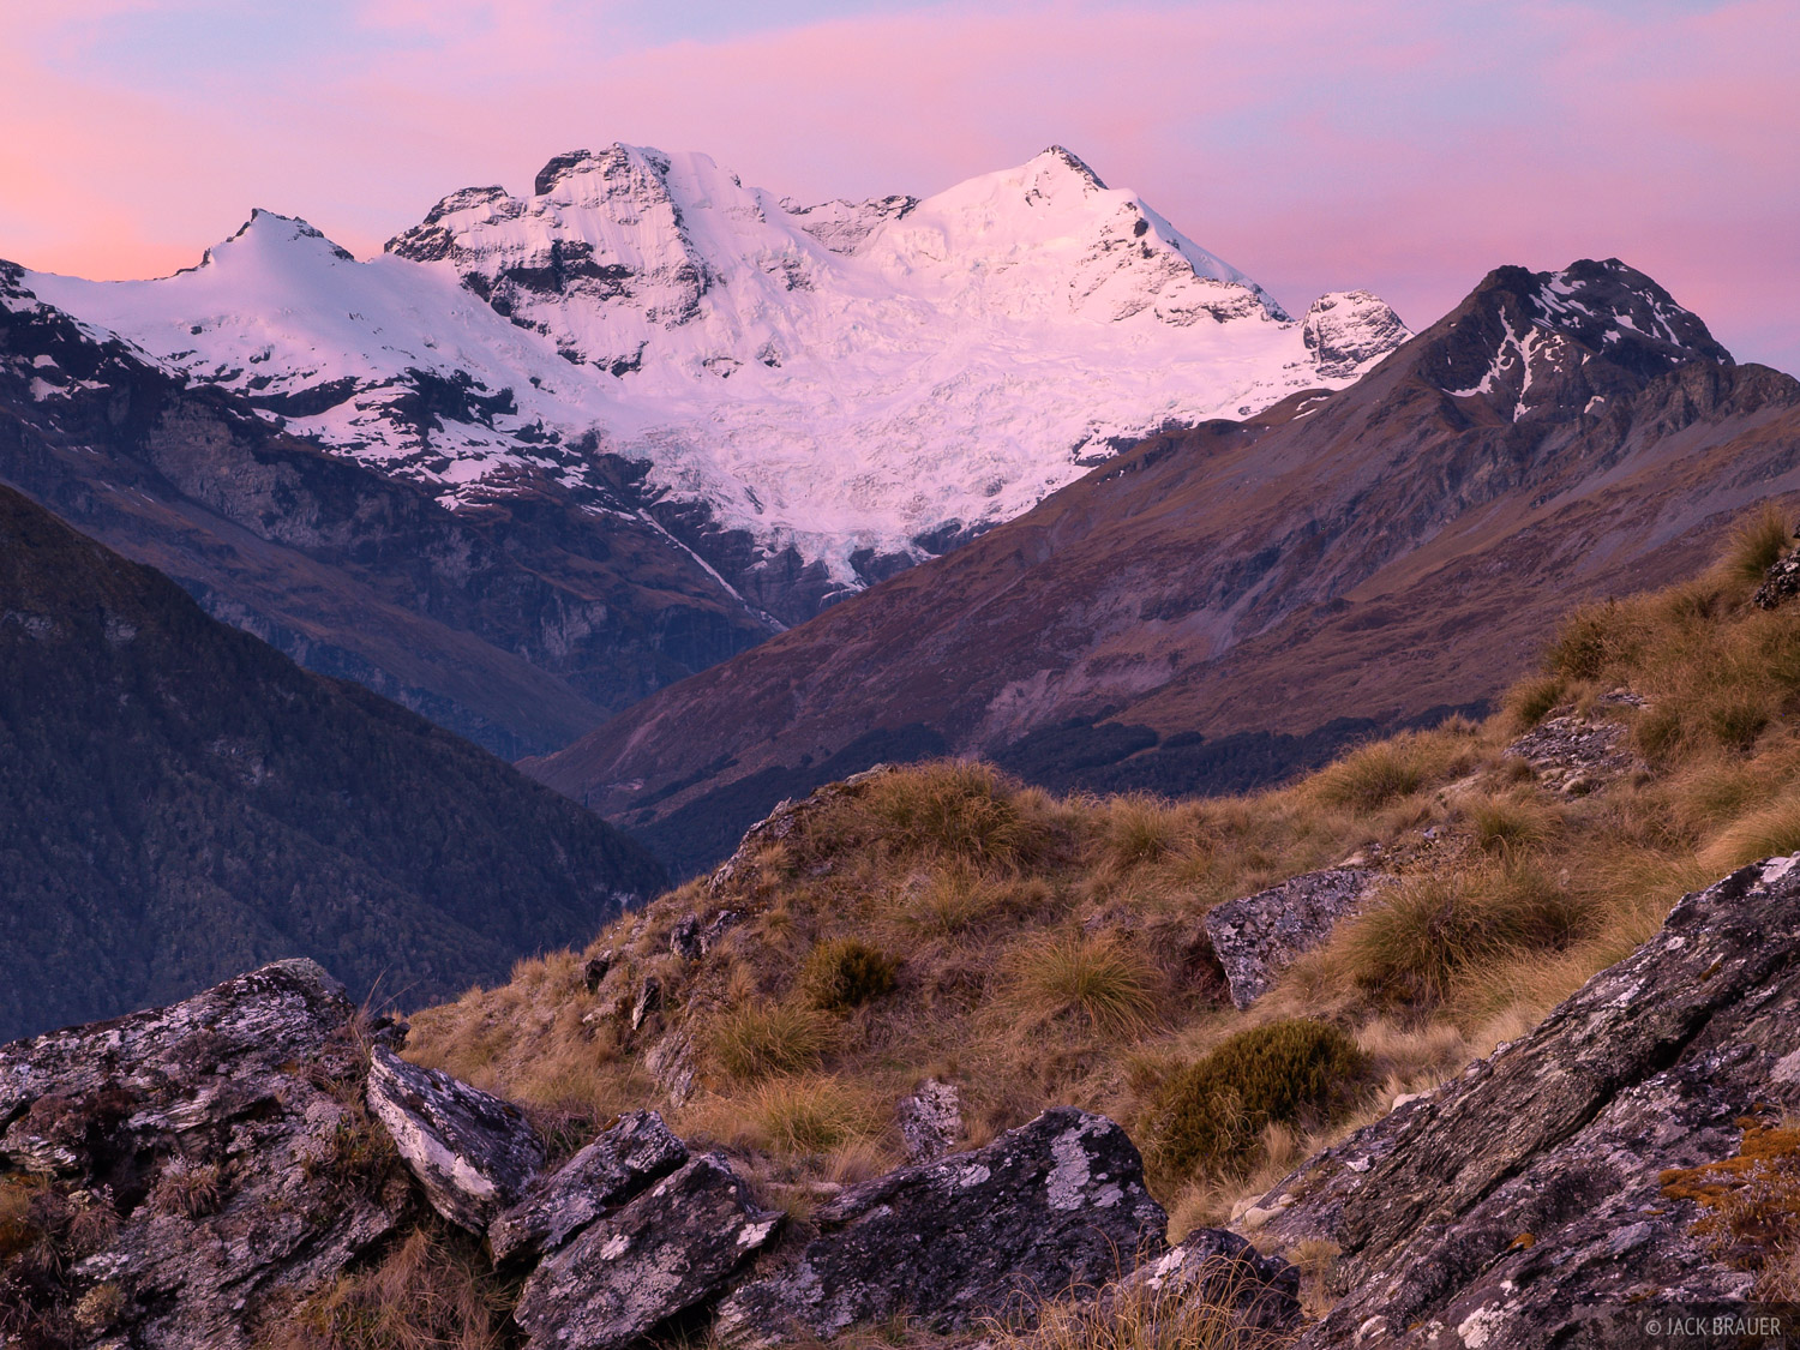 Mount Earnslaw, Mt. Aspiring, National Park, New Zealand, photo